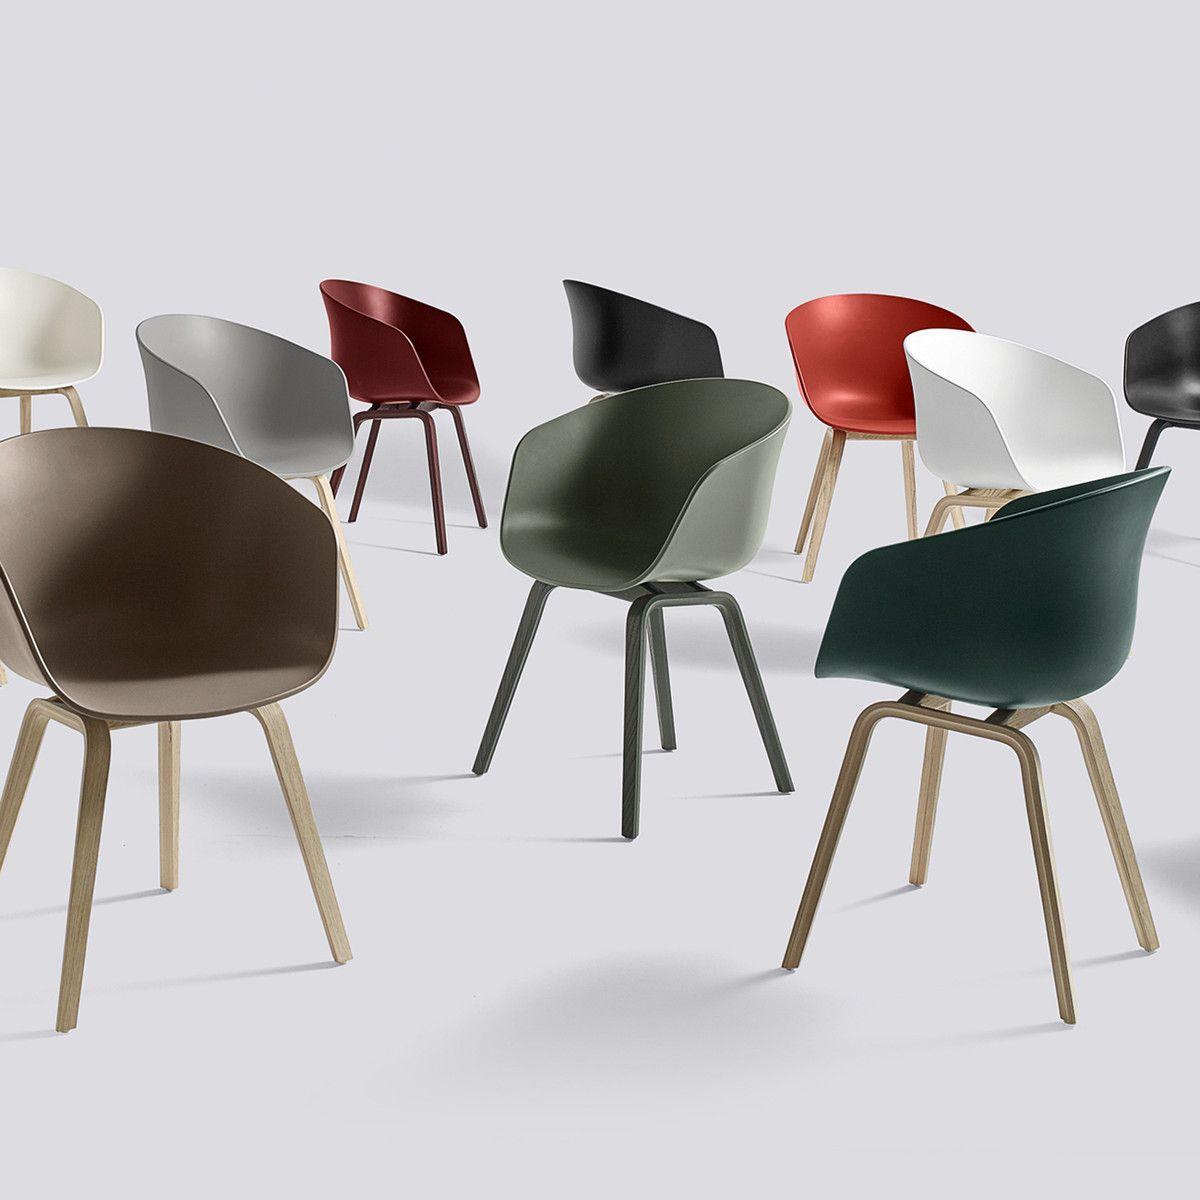 about a chair aac von hay in vielen farben erh ltlich shop the scandinavian look pinterest. Black Bedroom Furniture Sets. Home Design Ideas